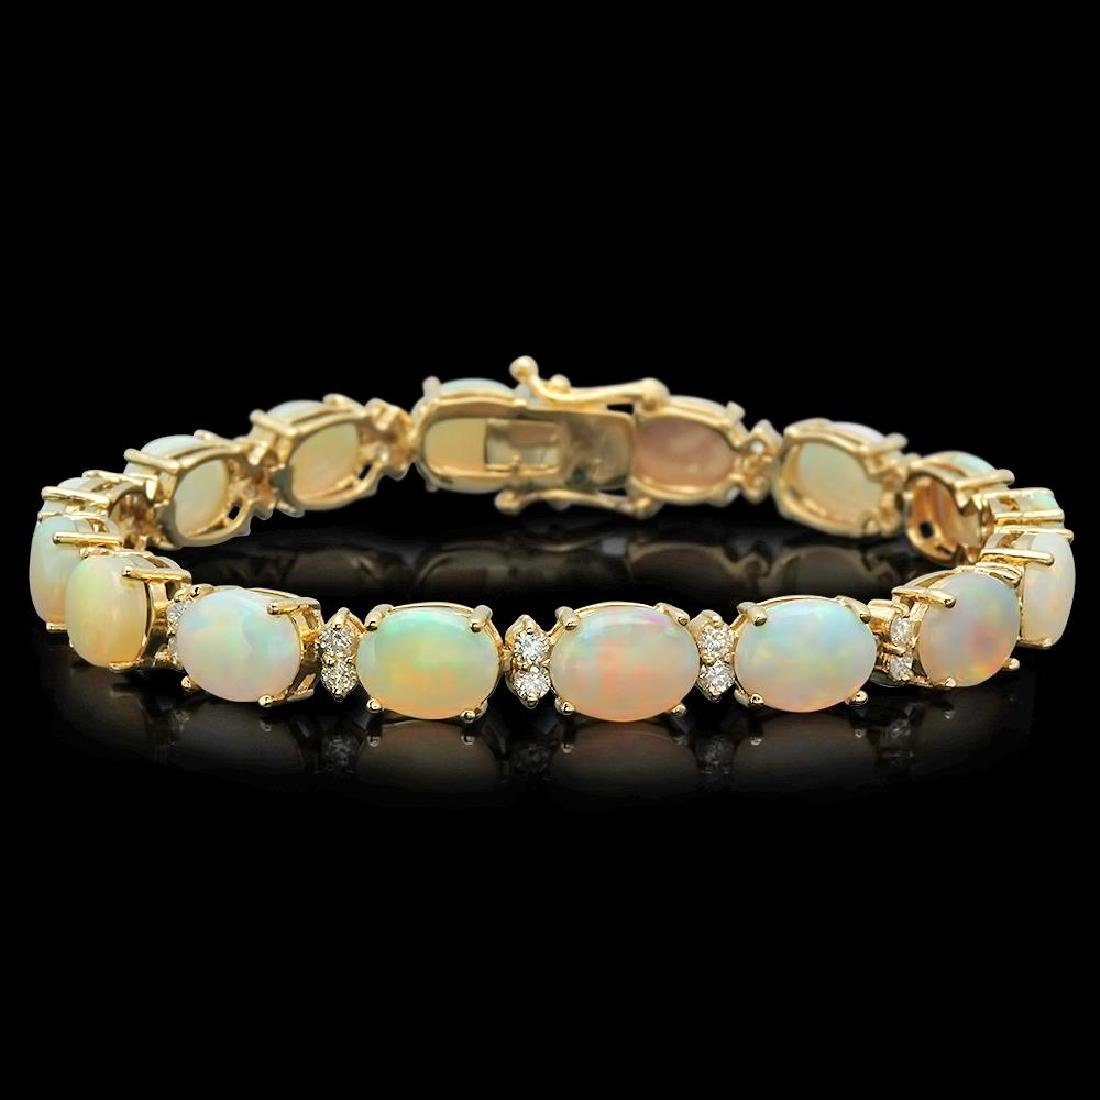 14K Gold 16.97ct Opal 1.45ct Diamond Bracelet